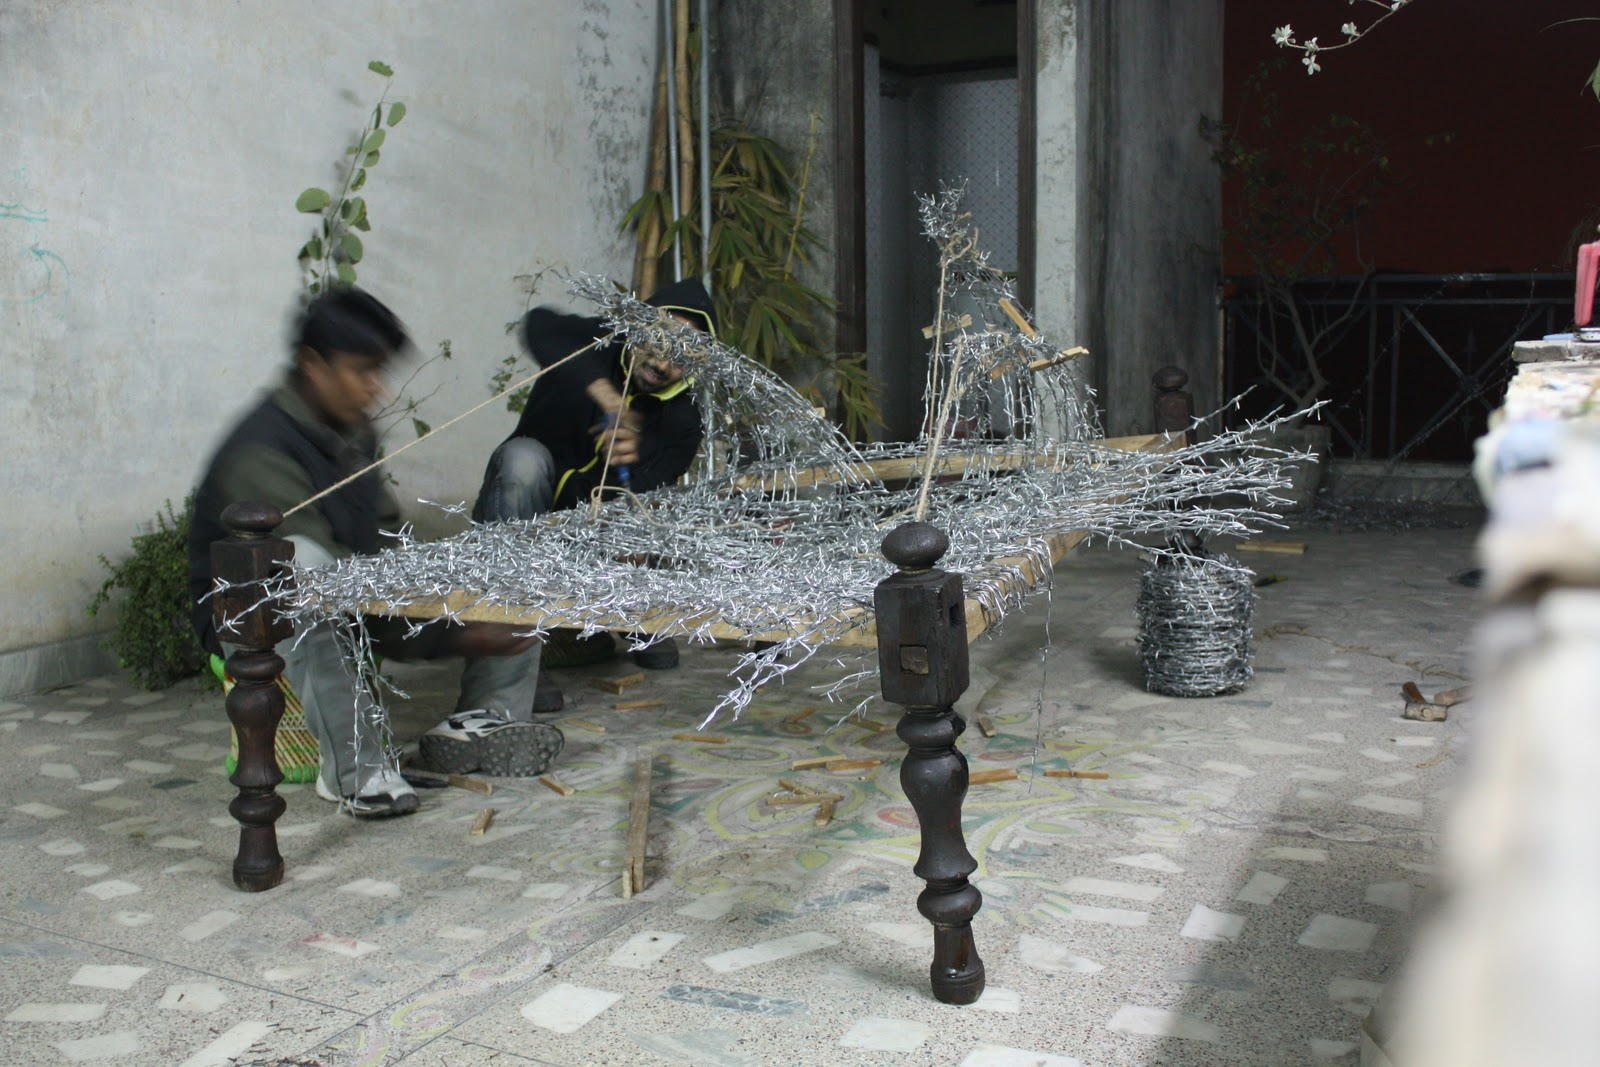 Weaving in, barbed wire, mild steel, wood, rope, 4 x 6 x 3.5 feet ...